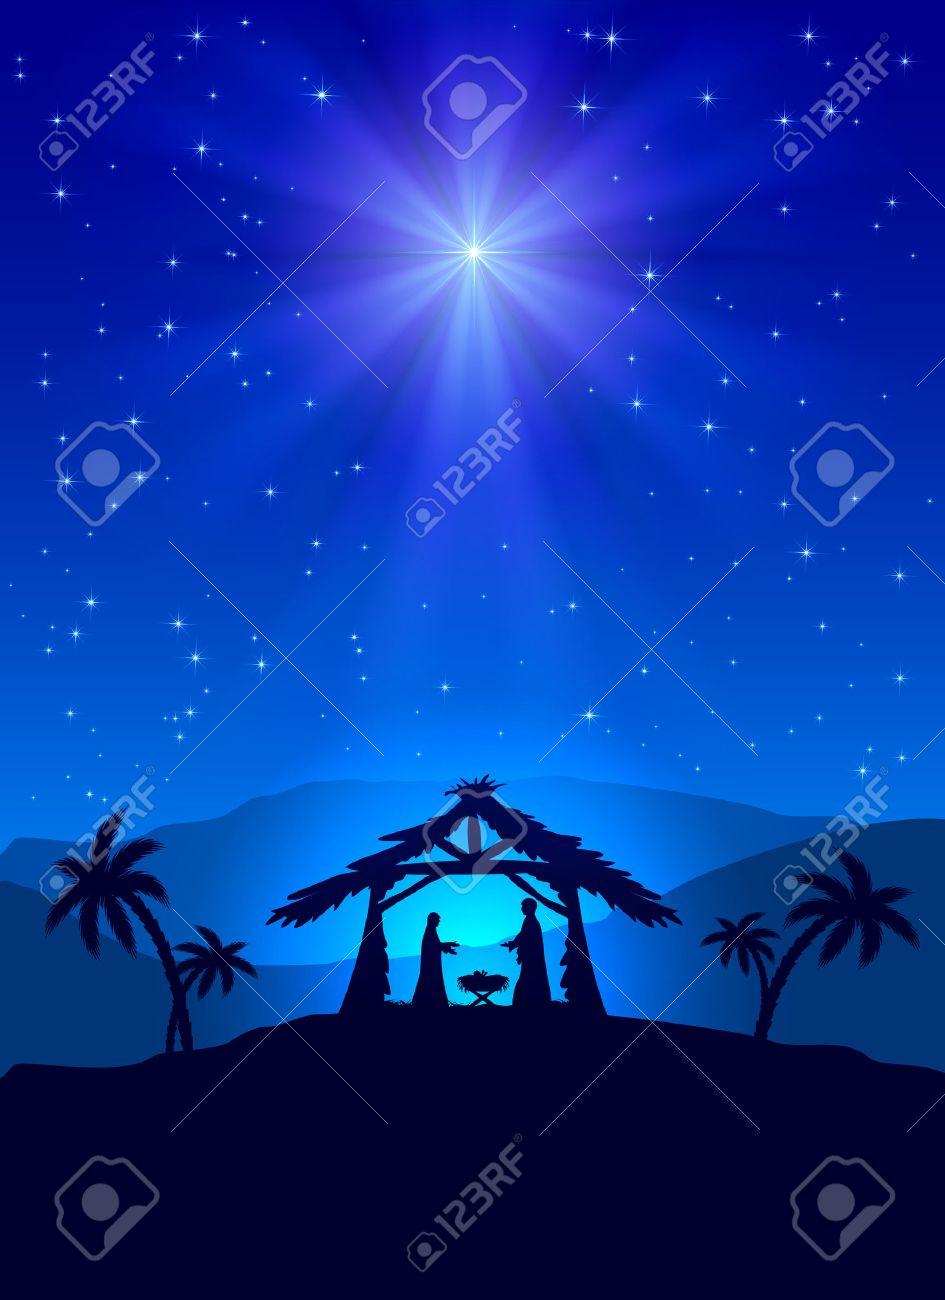 Christian Christmas Night With Shining Star And Jesus, Illustration ...